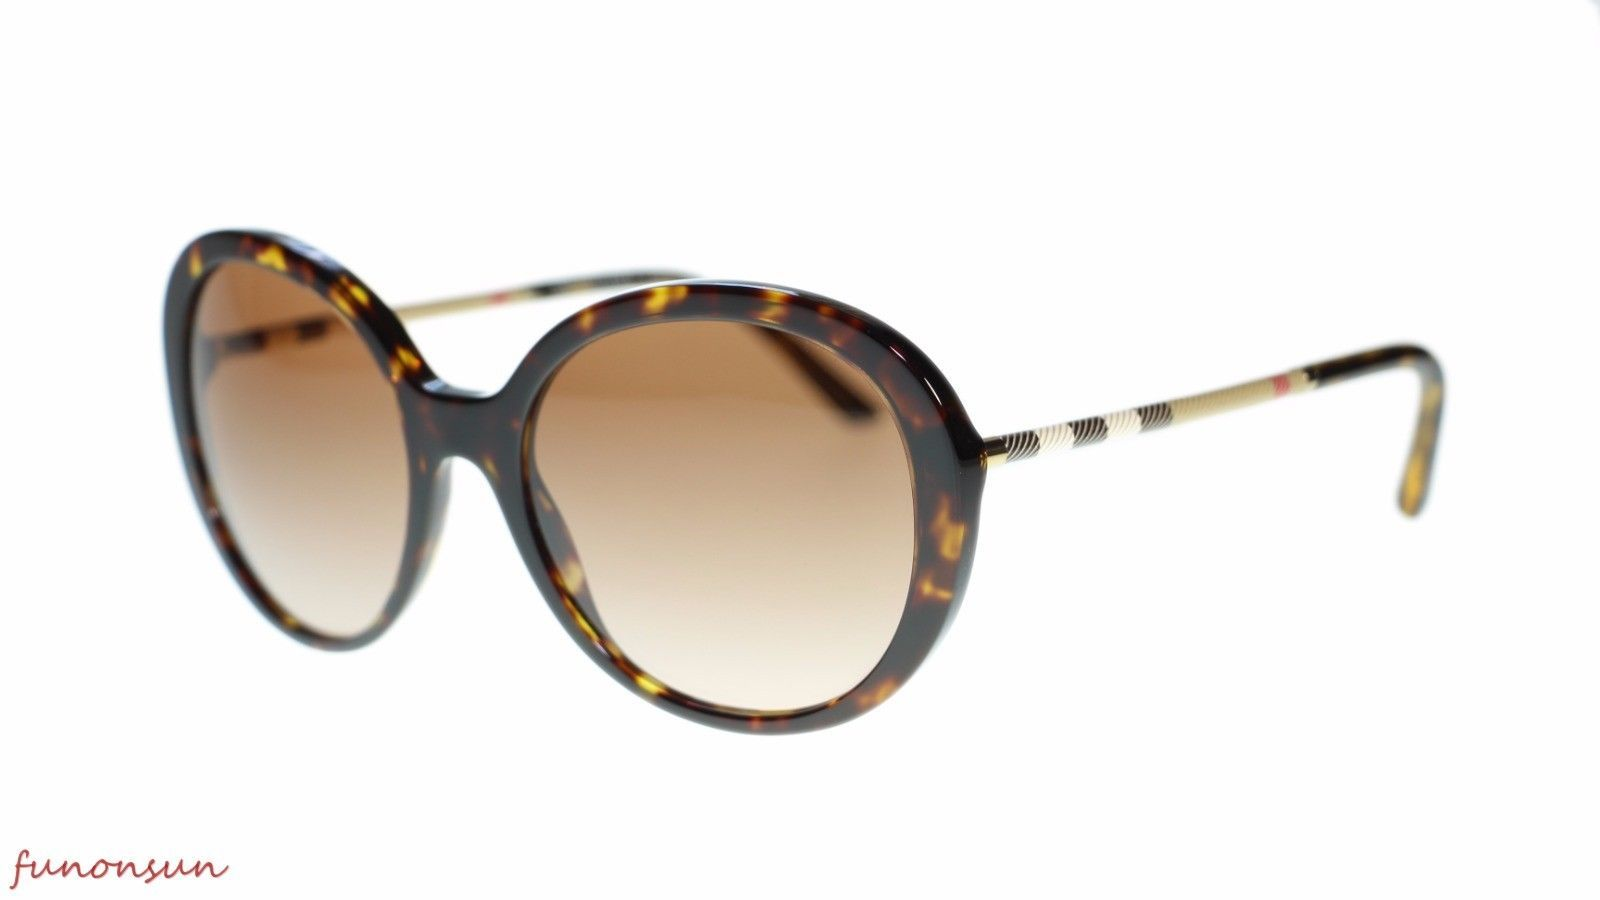 54cdda0e49c4 10. 10. Previous. Burberry Women Sunglasses BE4239Q 300213 Havana Brown  Gradient Lens 57mm